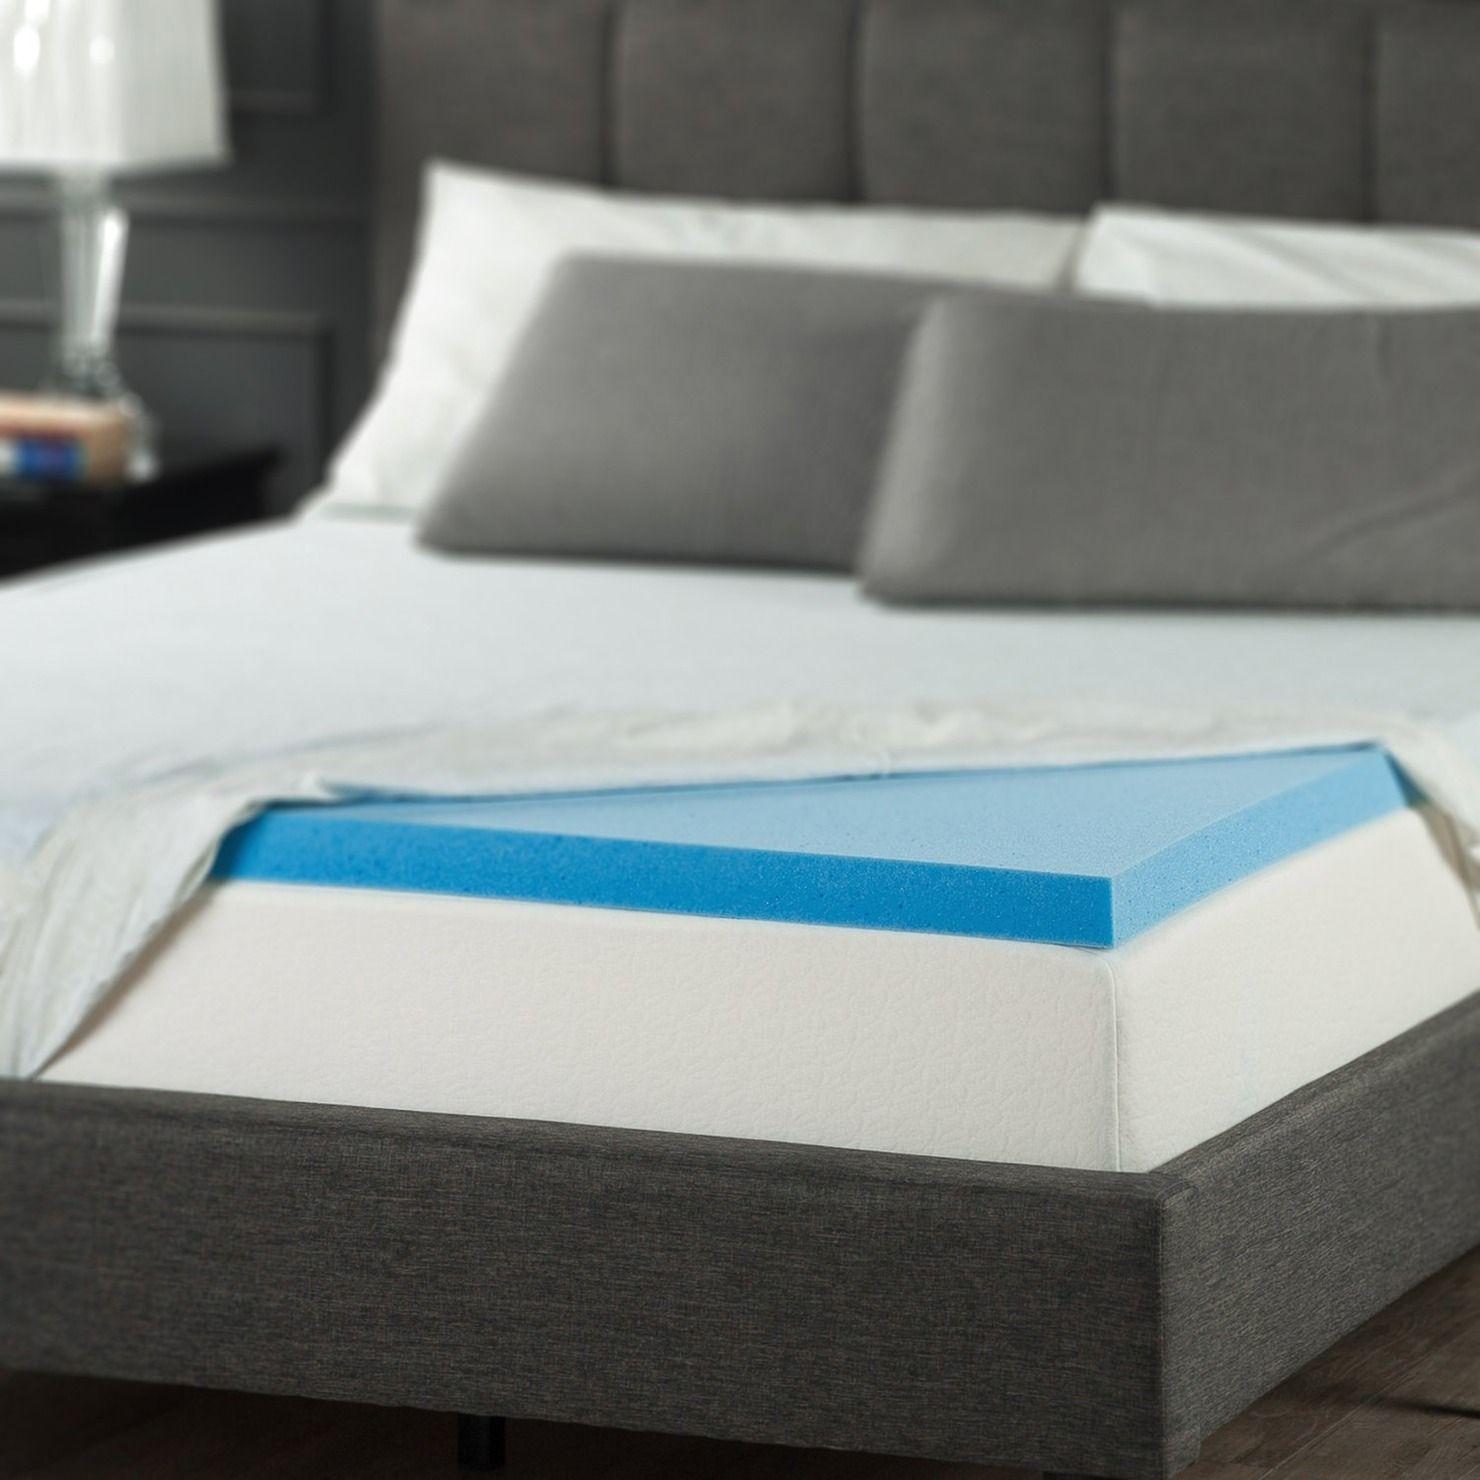 11 Weird But Genius Items To Stop Sleep Sweats Memory Foam